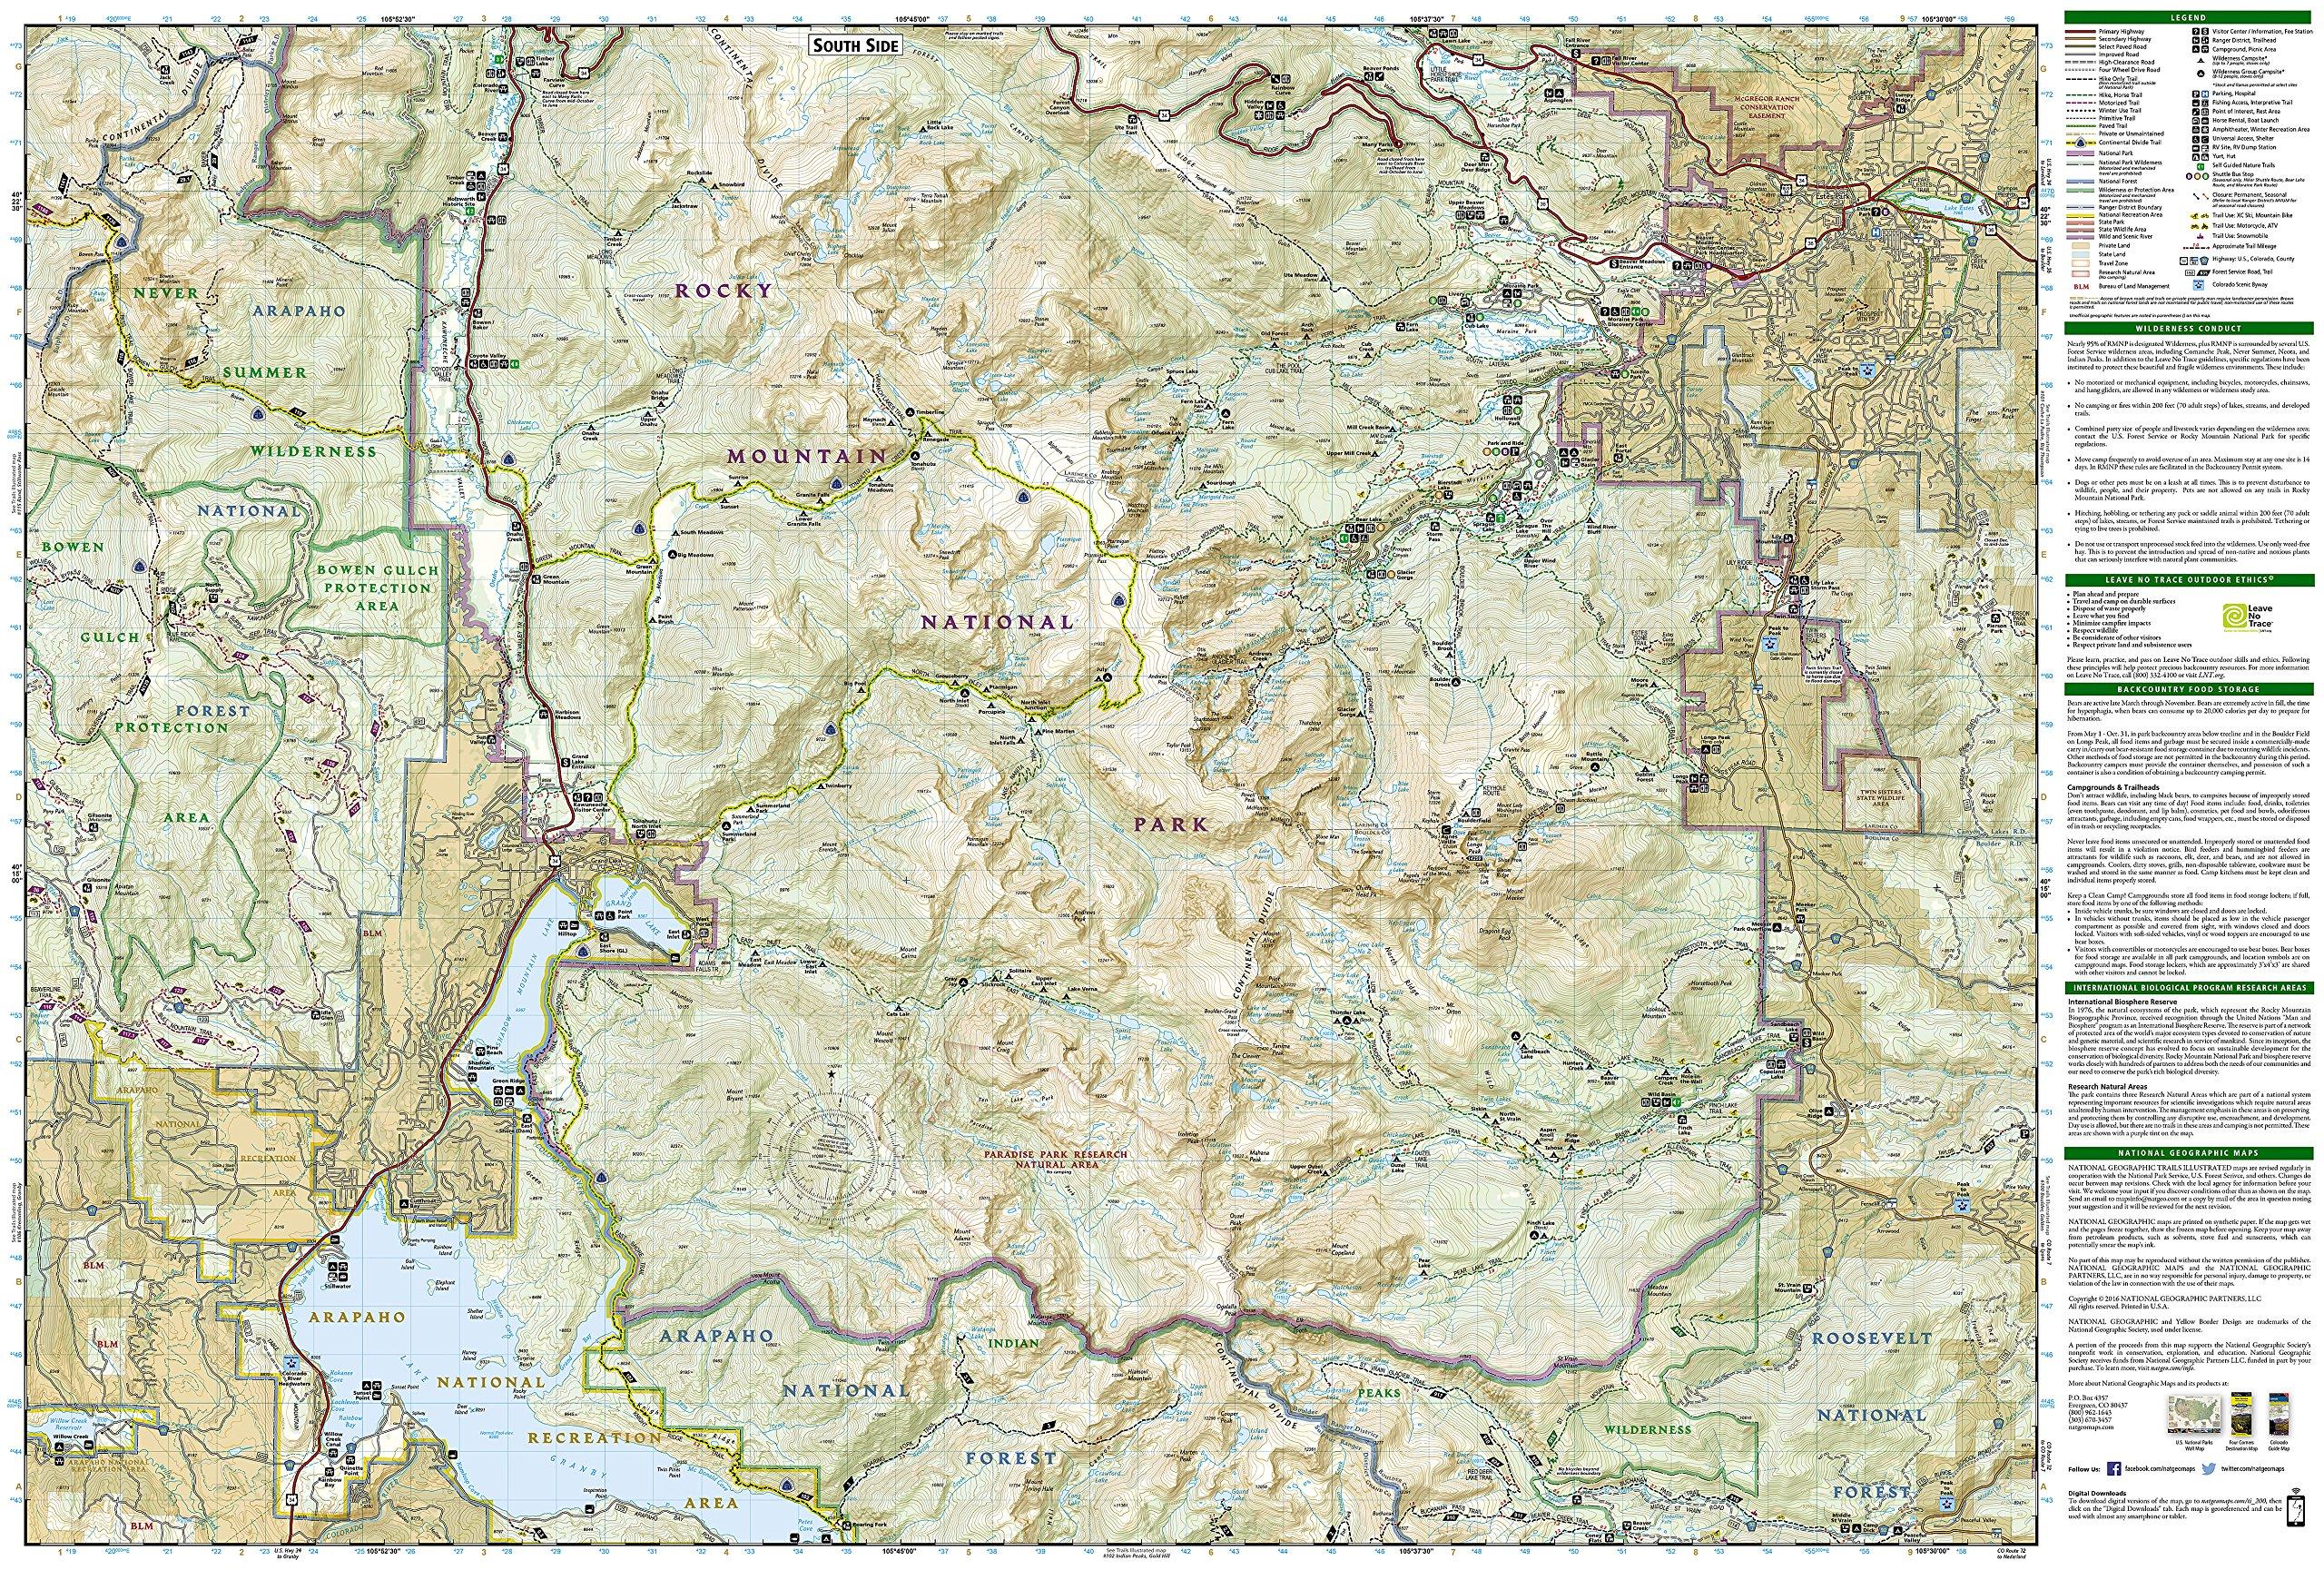 rocky mountain national park hiking map trails illustrated maps 9781566953429 amazoncom books